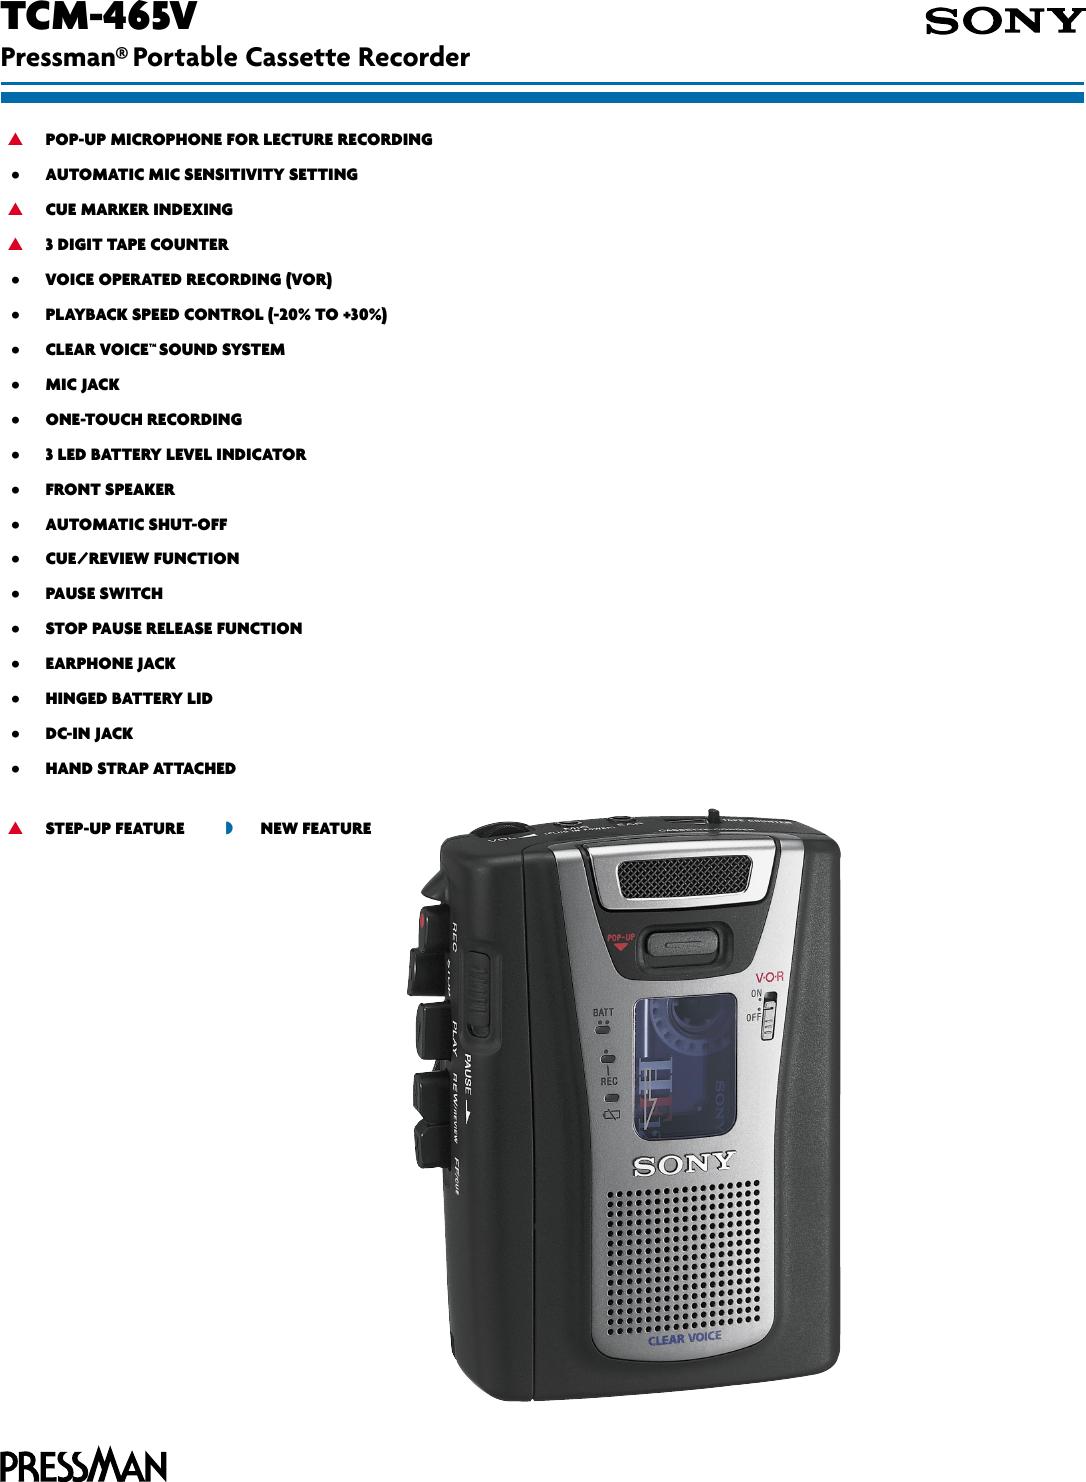 sony tcm 465v son 907 user manual marketing specifications tcm465v sp rh usermanual wiki Sony User Manual Guide Sony Operating Manuals ICD-UX523